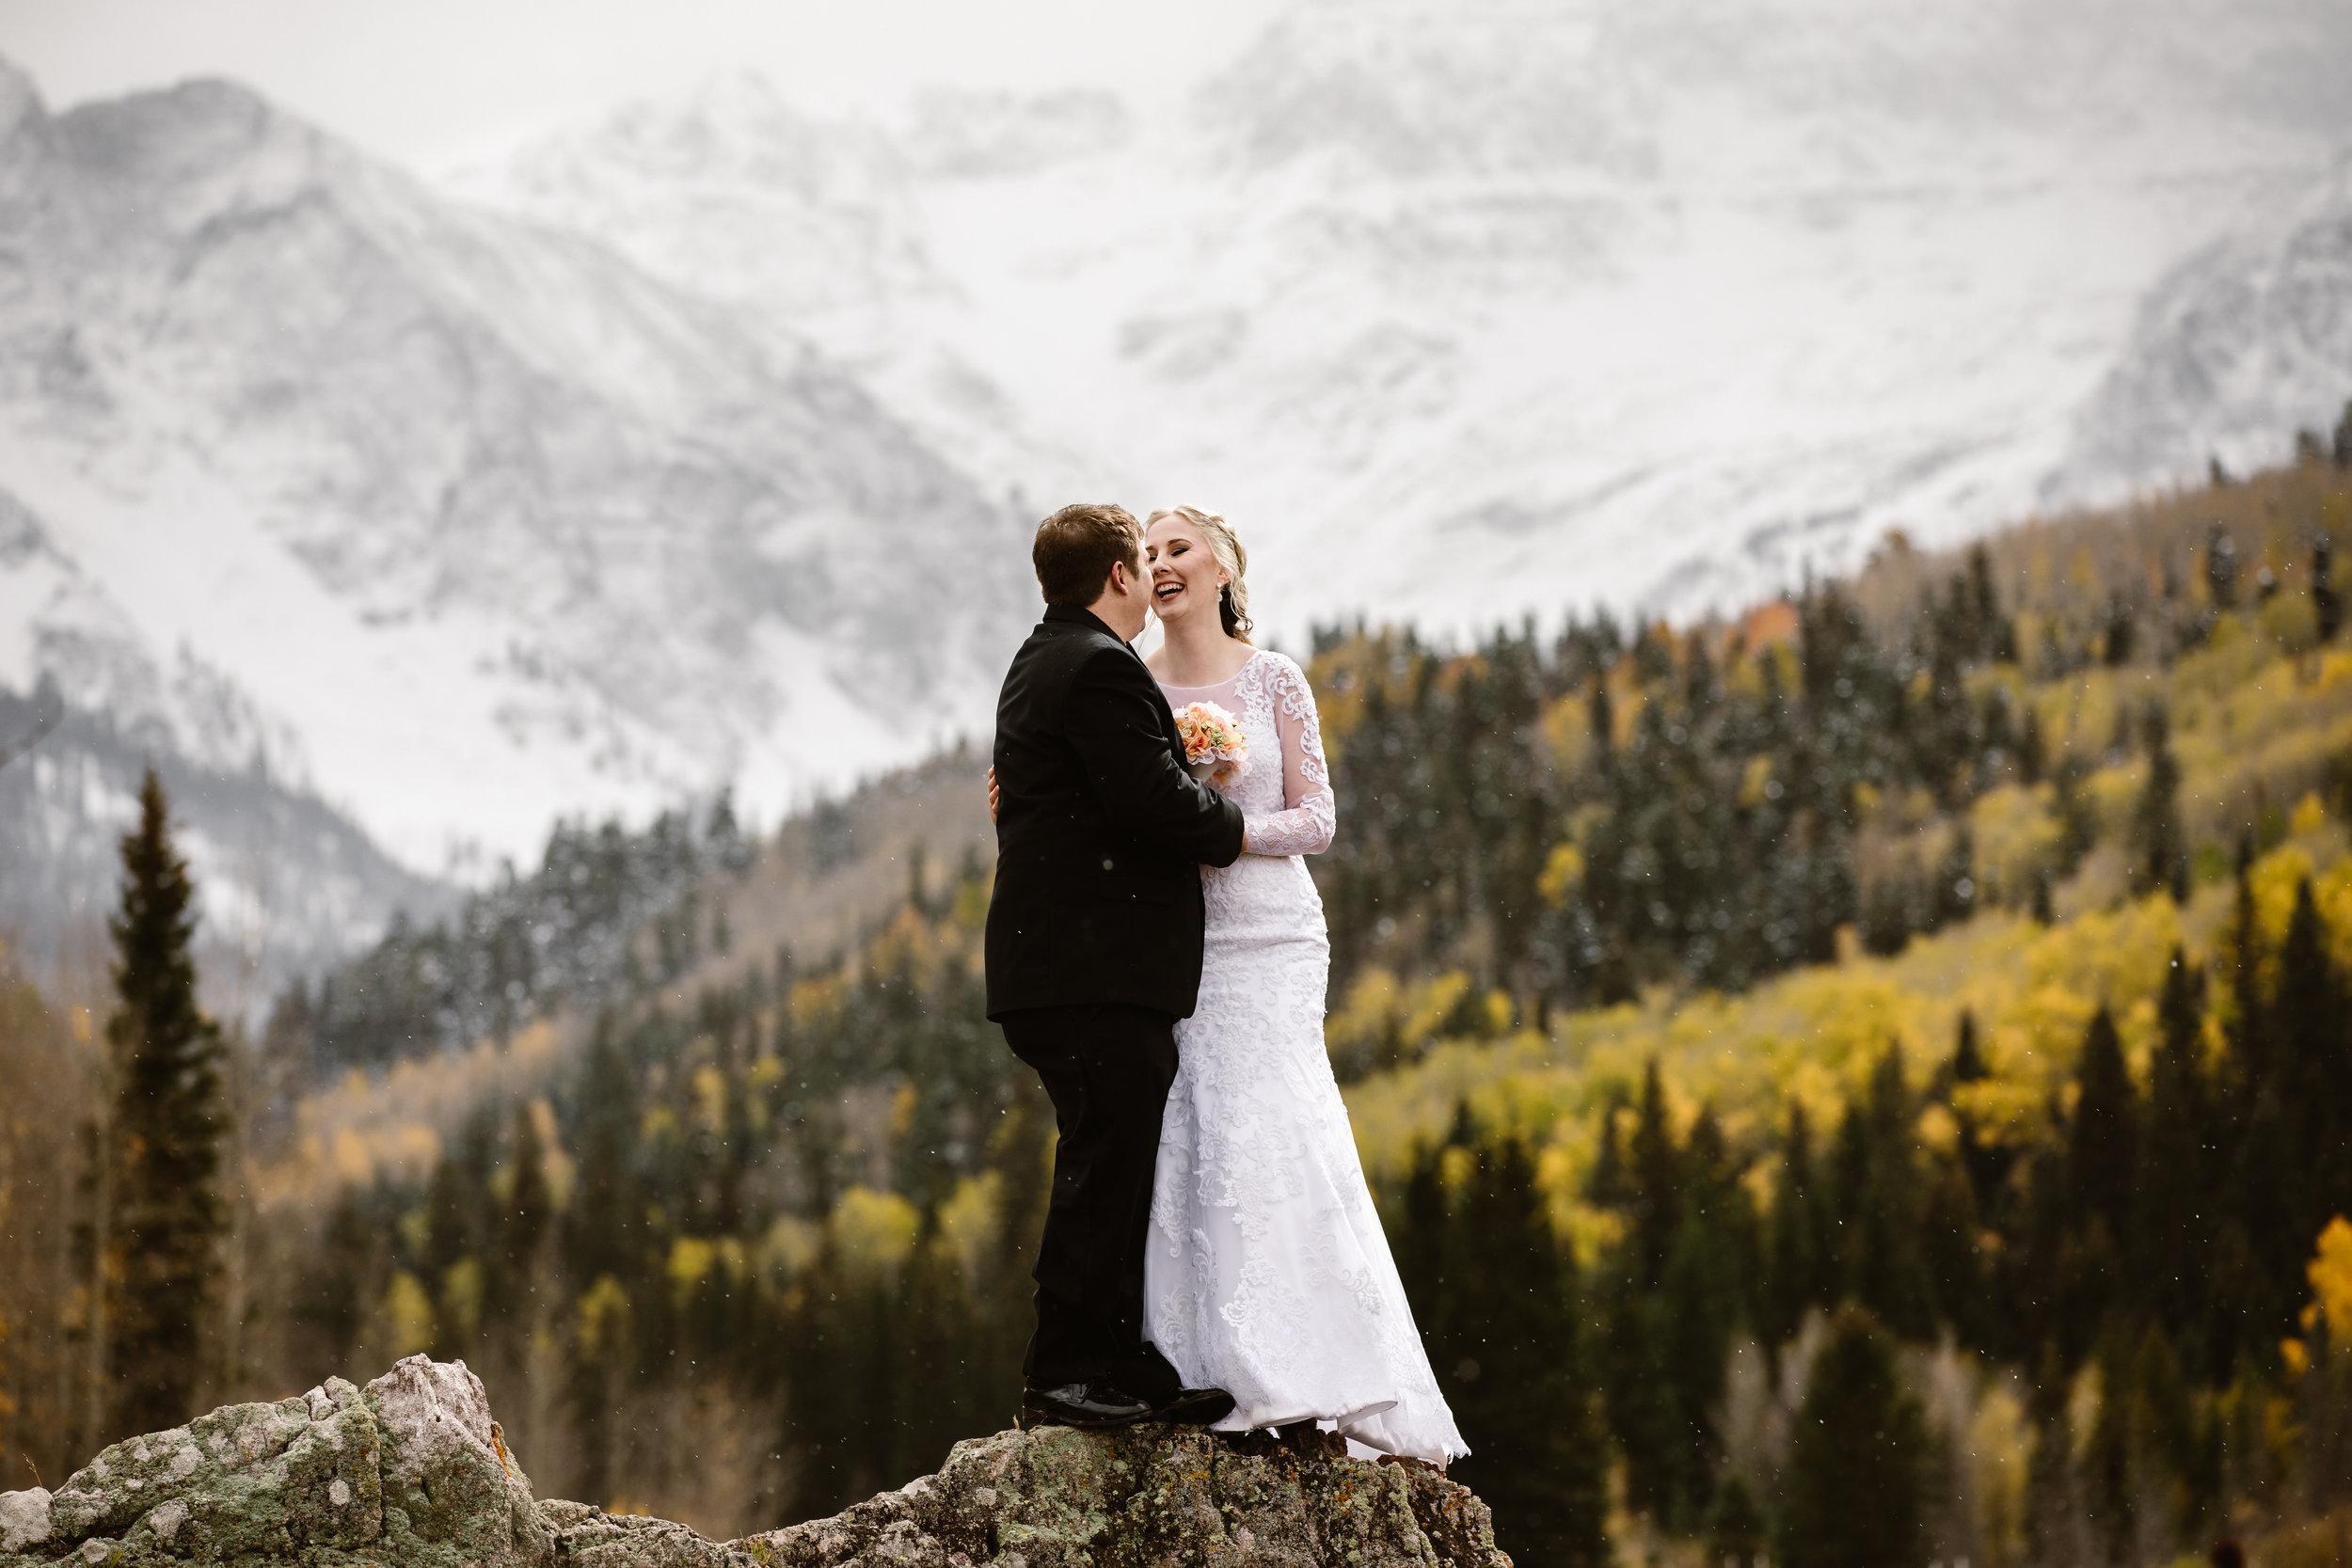 AN-Telluride-WeddingPhotographer-LeahandAshtonPhotography-408.jpeg